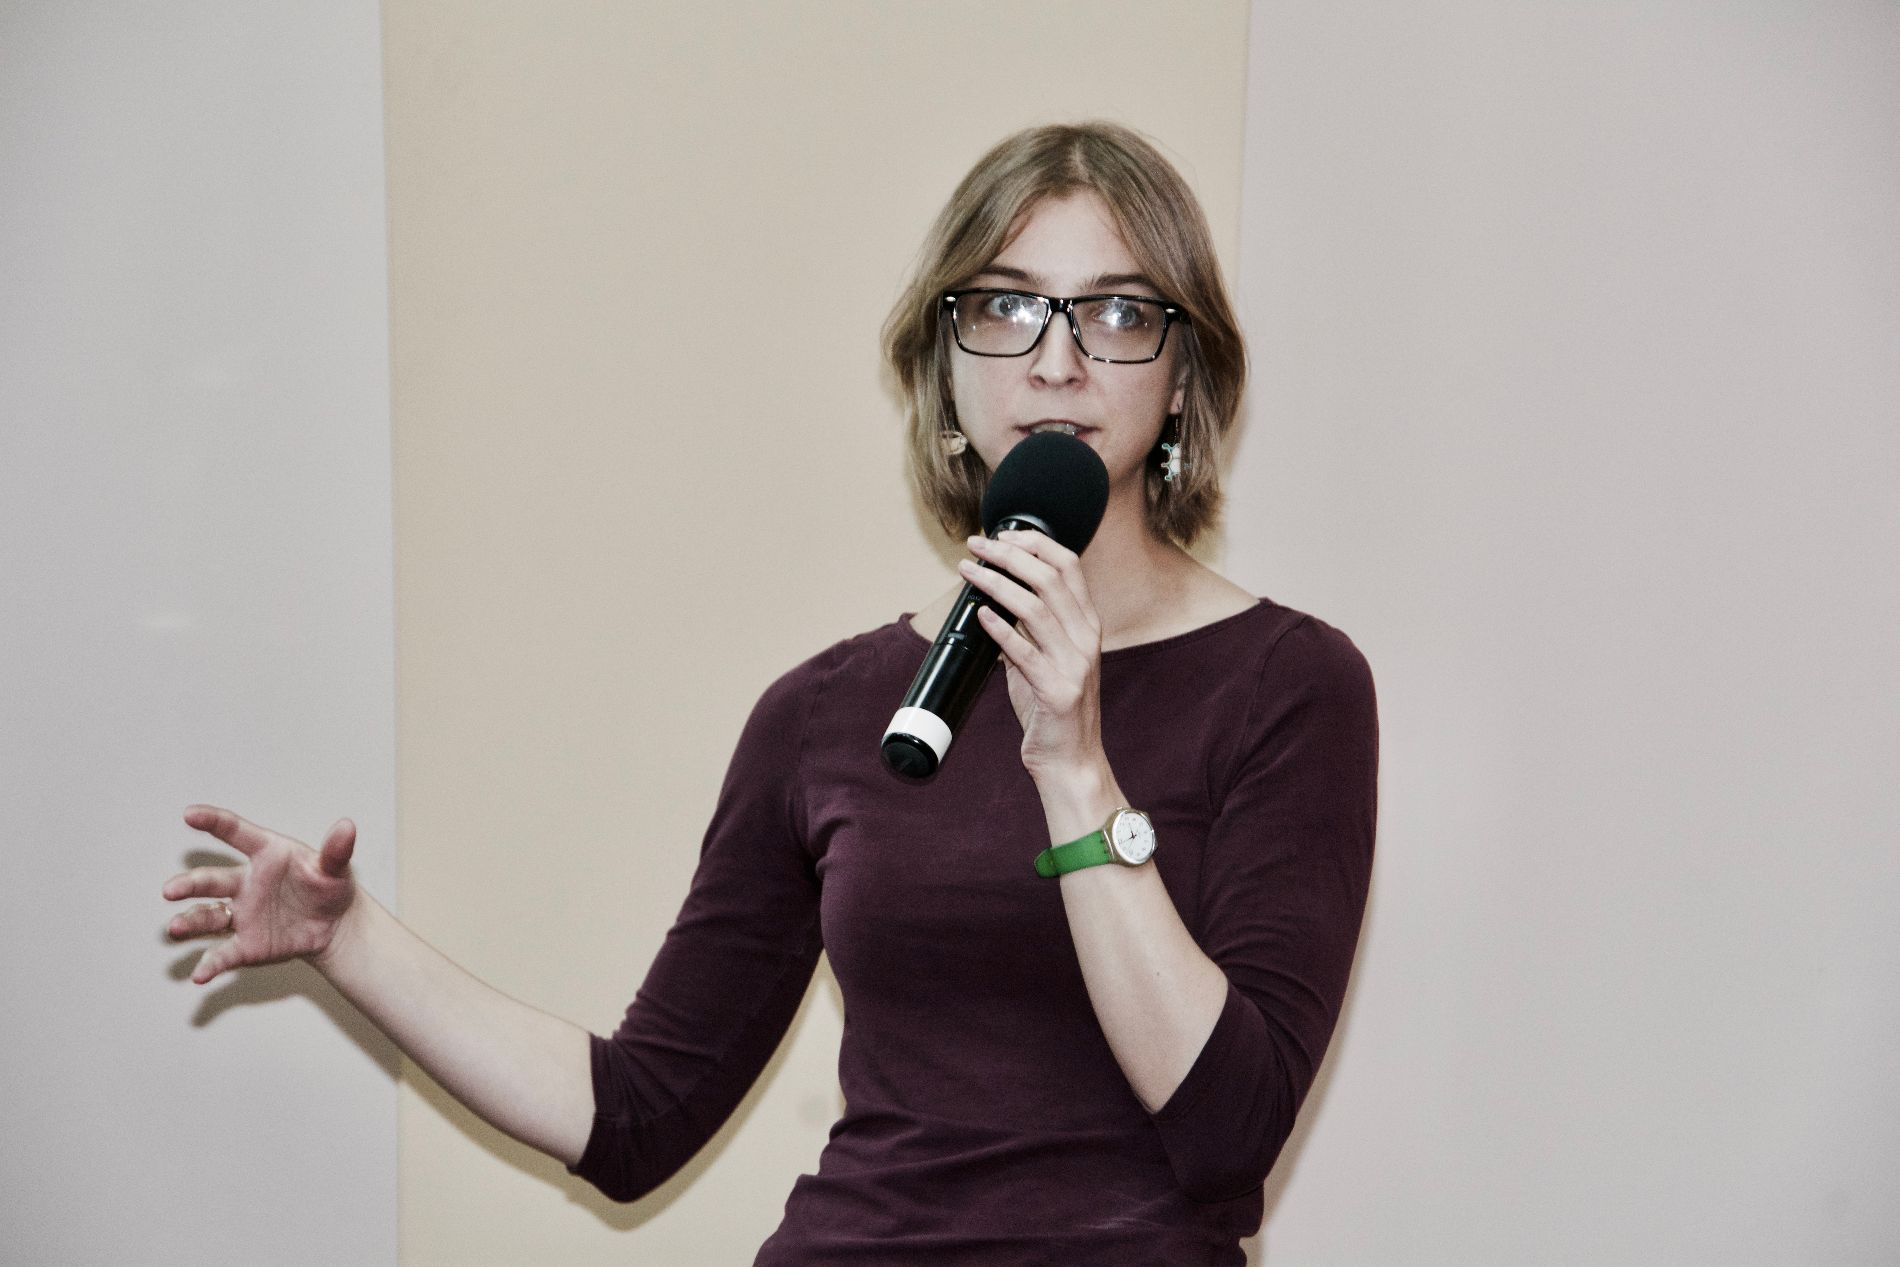 Ася Казанцева на лекции в Краснодаре 9 октября 2016 года, фото Анастасии Андерс ©Фото Юга.ру